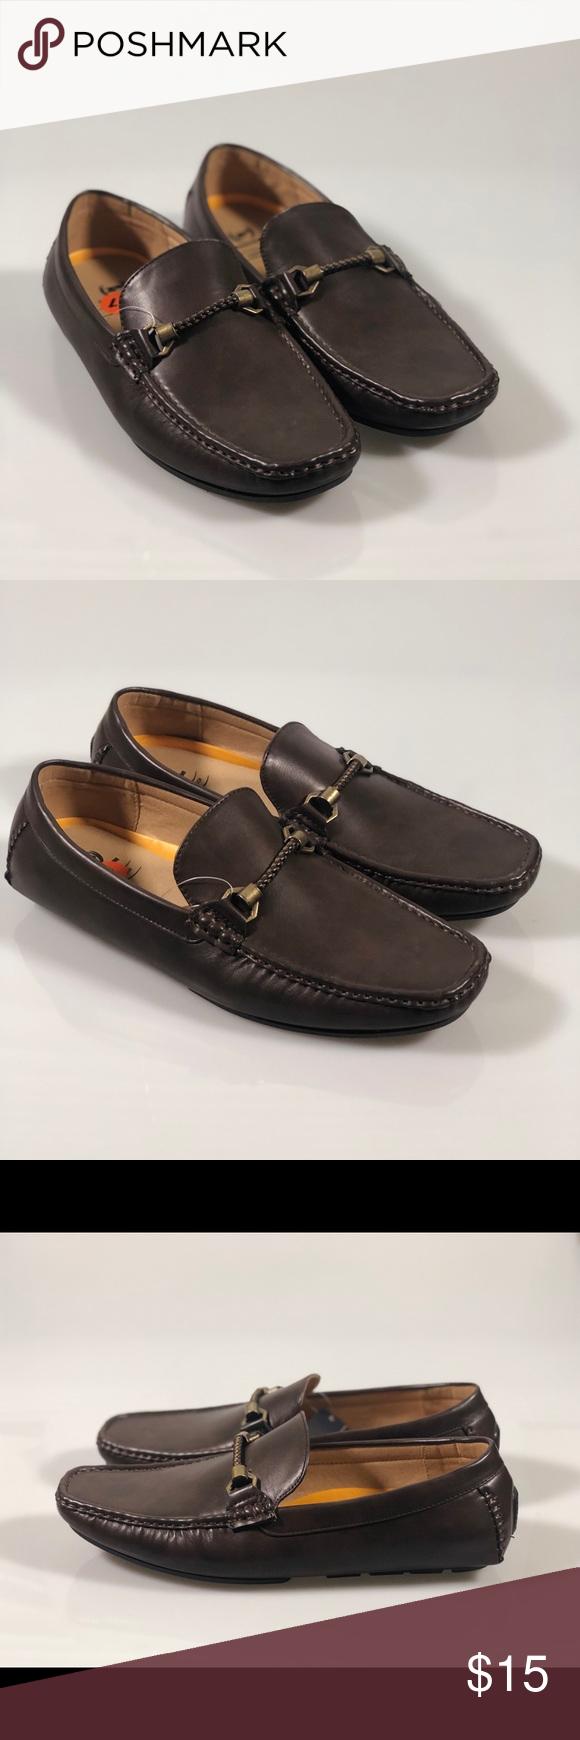 PHATFARM Men/'s Black Loafer Shoes.